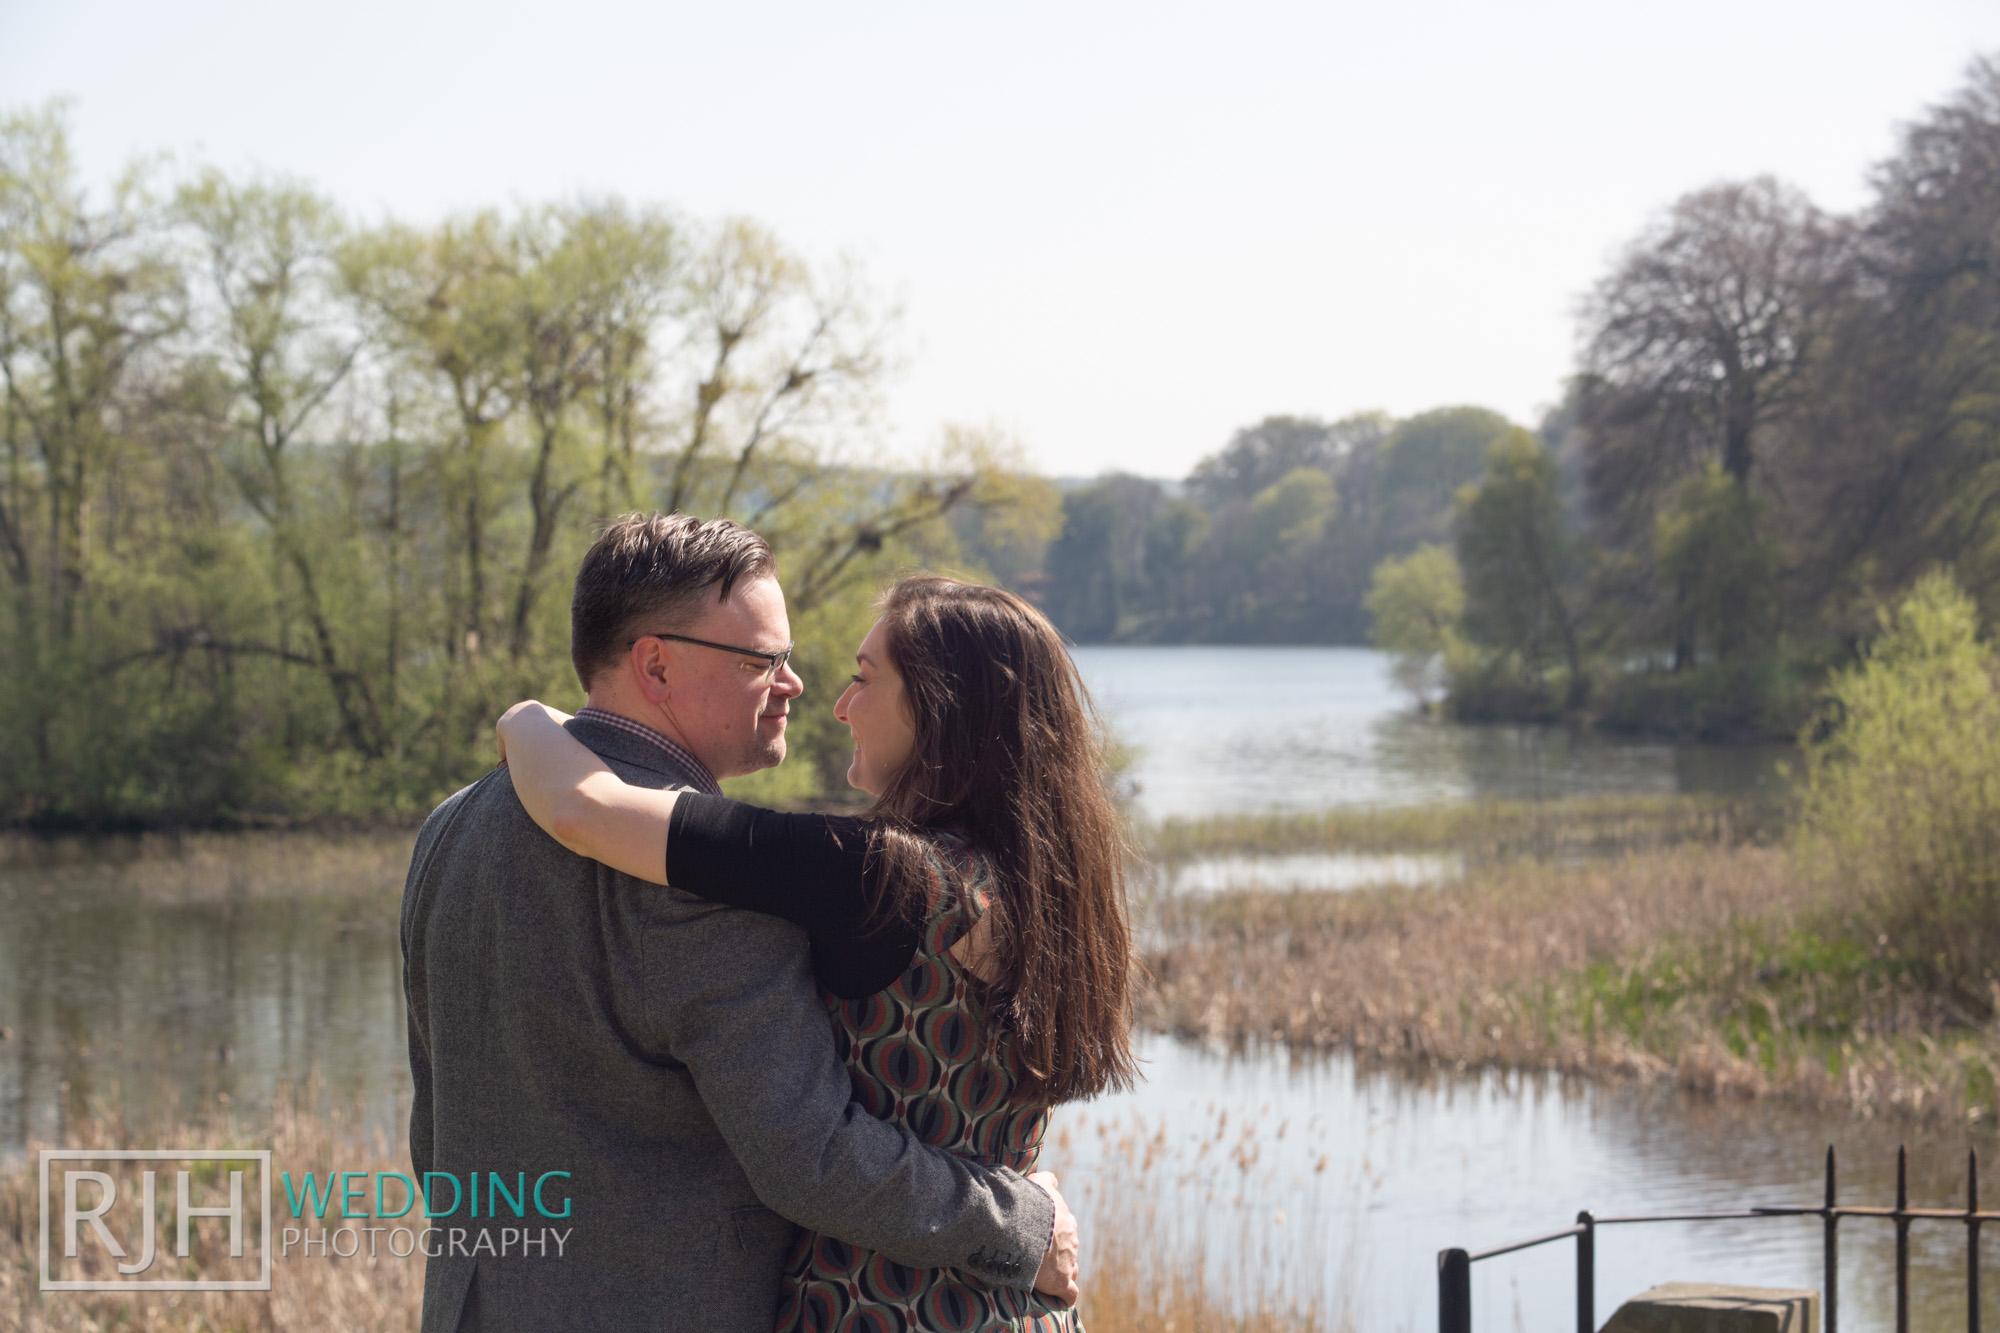 Pre-wedding photography - Richard & Rachel_024_3C2A8309.jpg